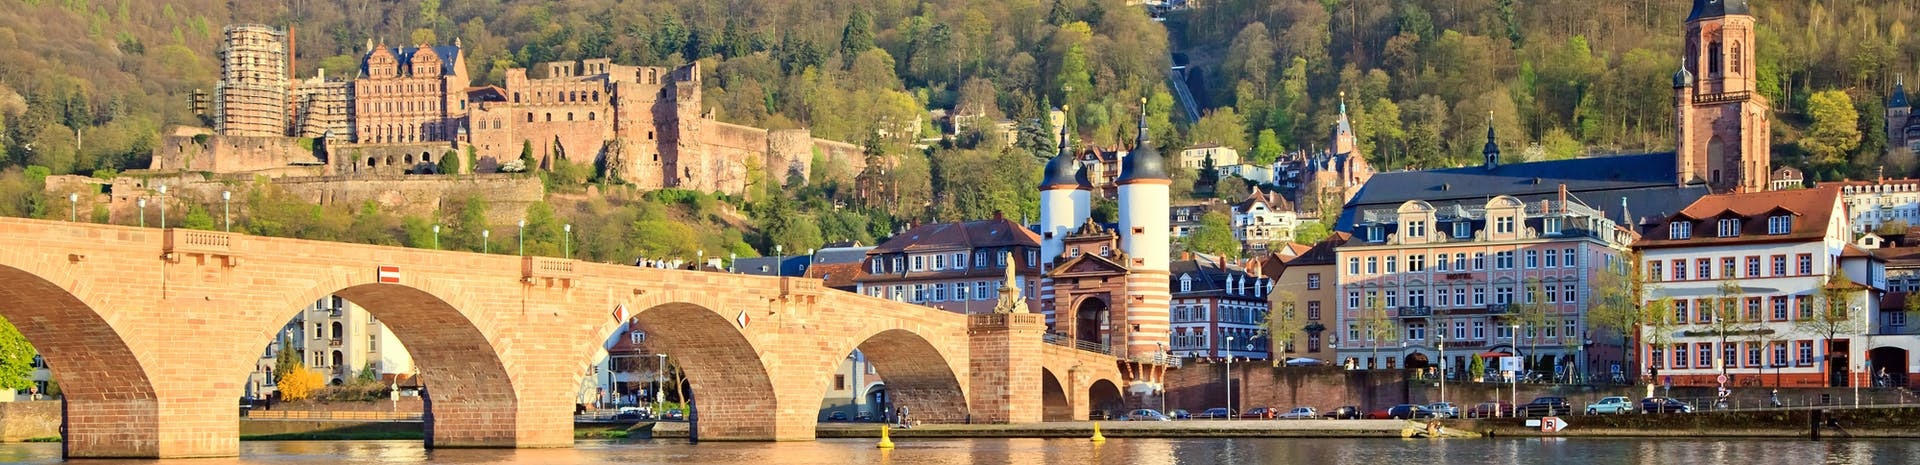 Picture of Heidelberg